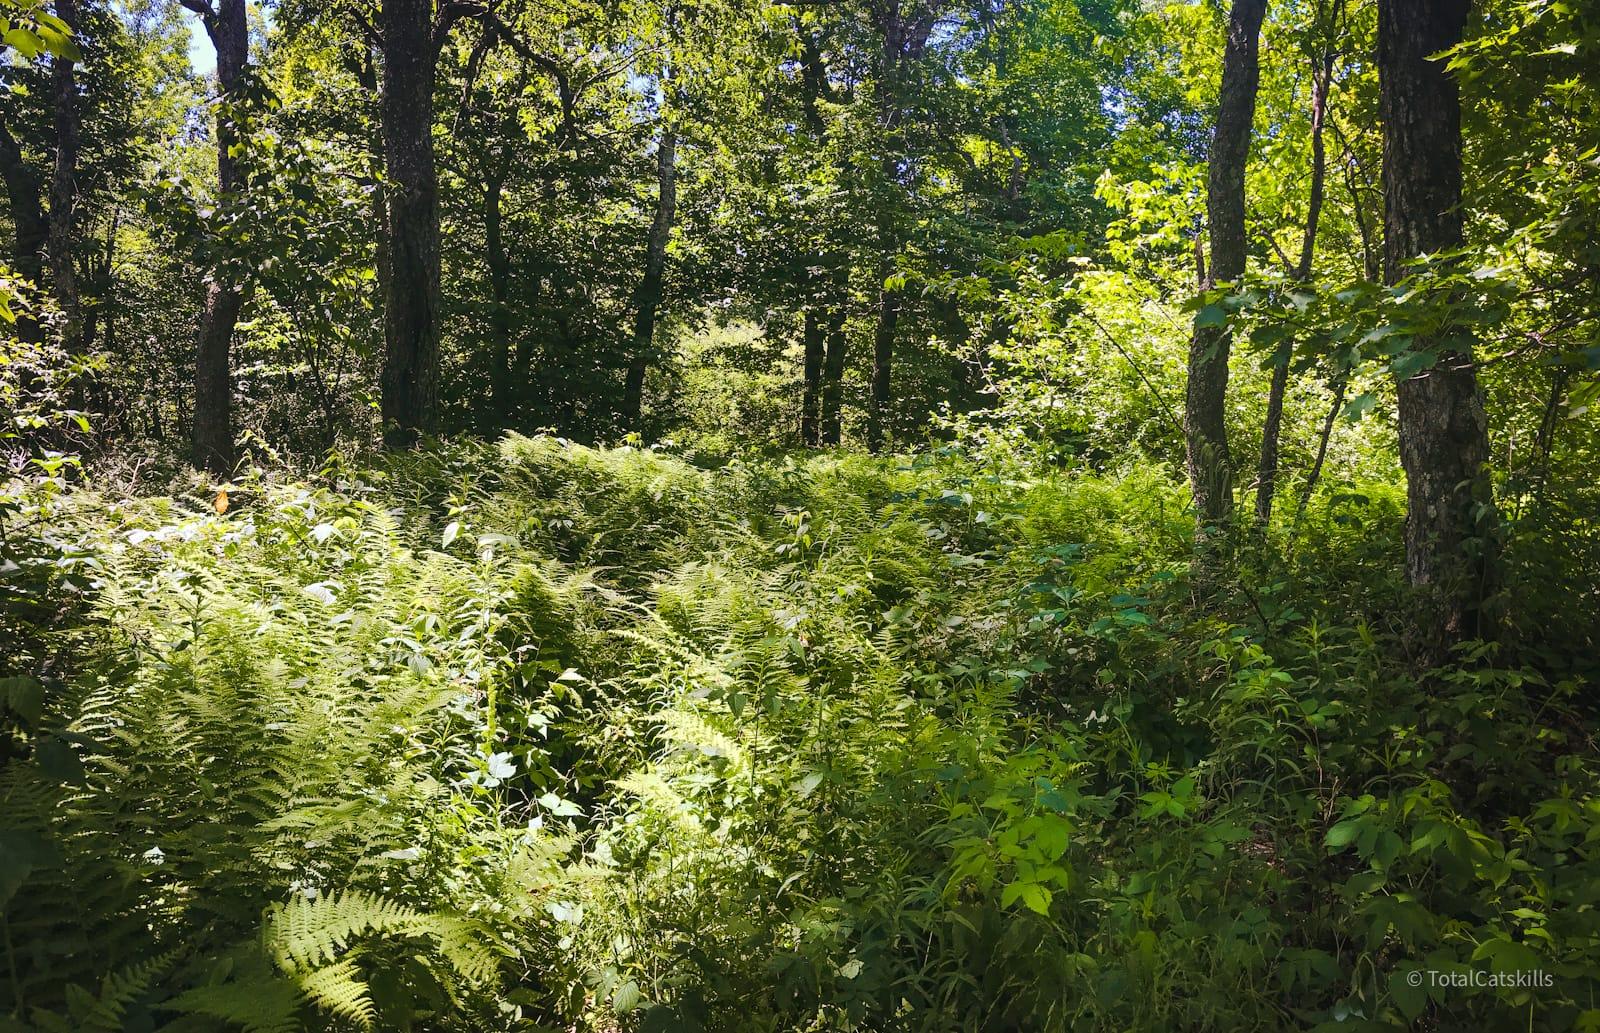 fern glade in woods